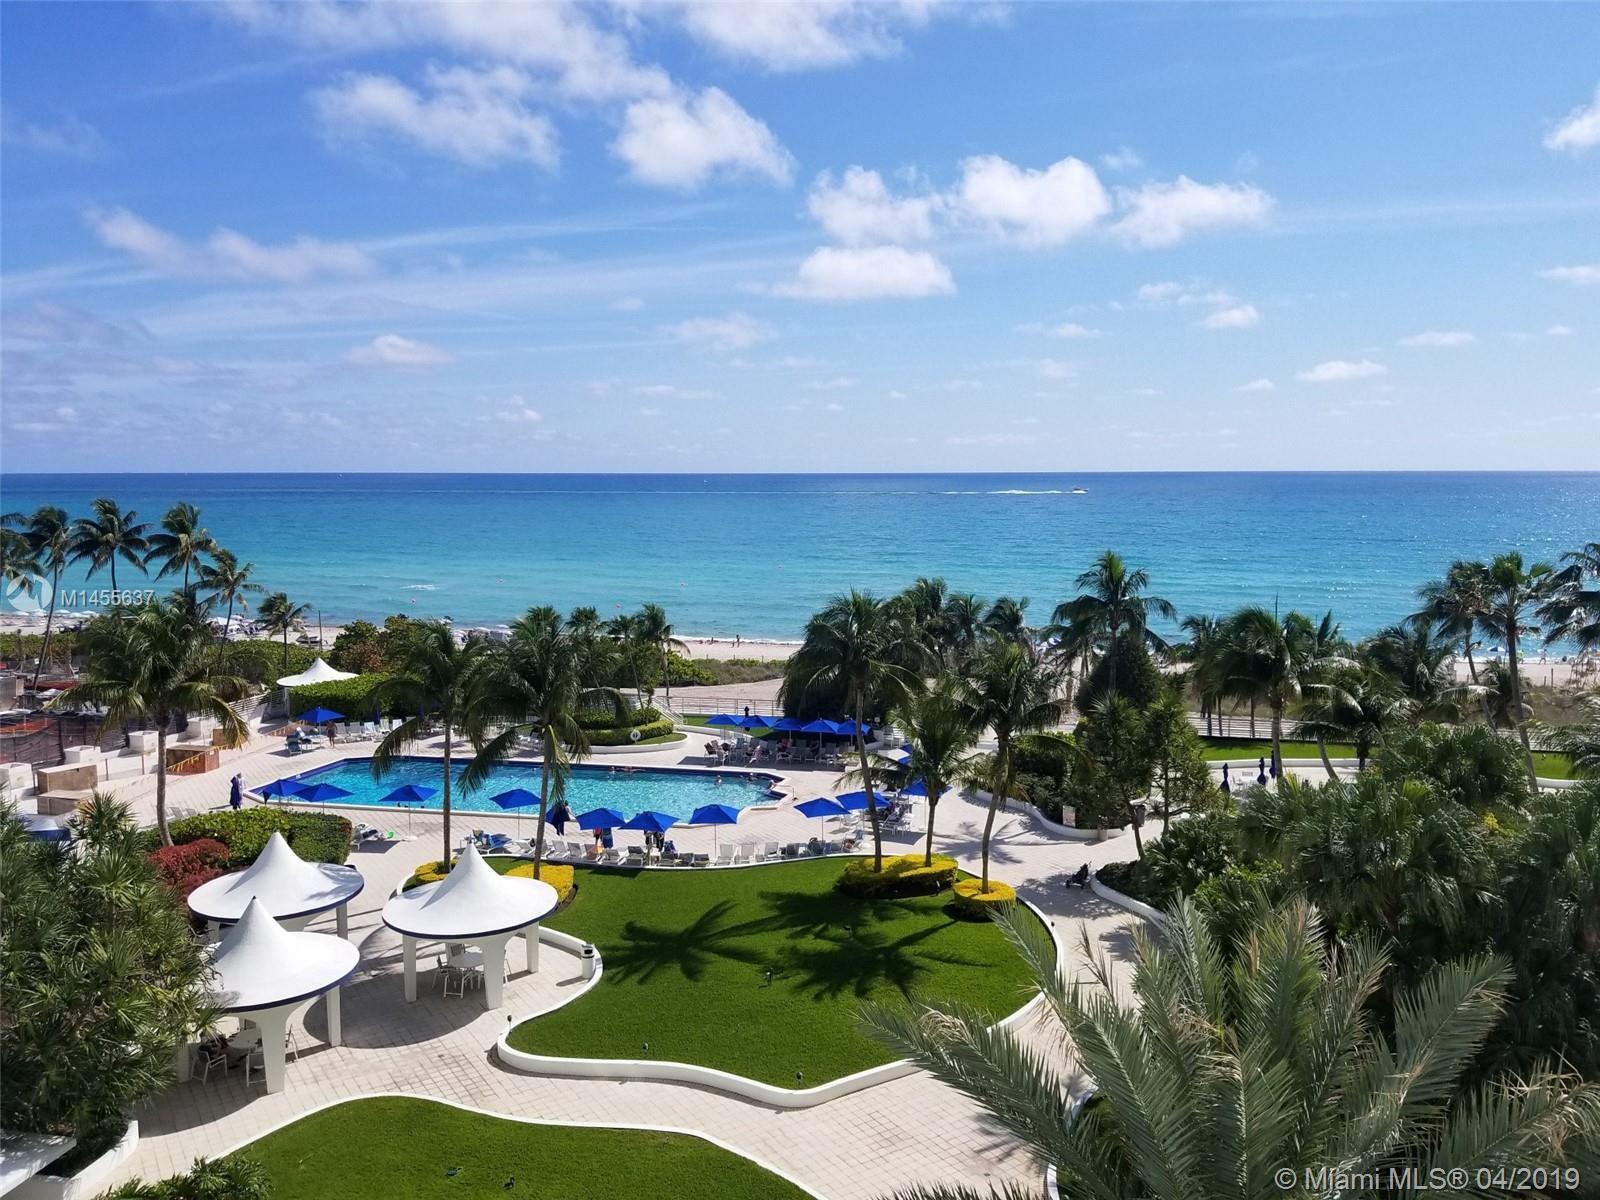 Seacoast 5151 #819 - 5151 COLLINS AV #819, Miami Beach, FL 33140